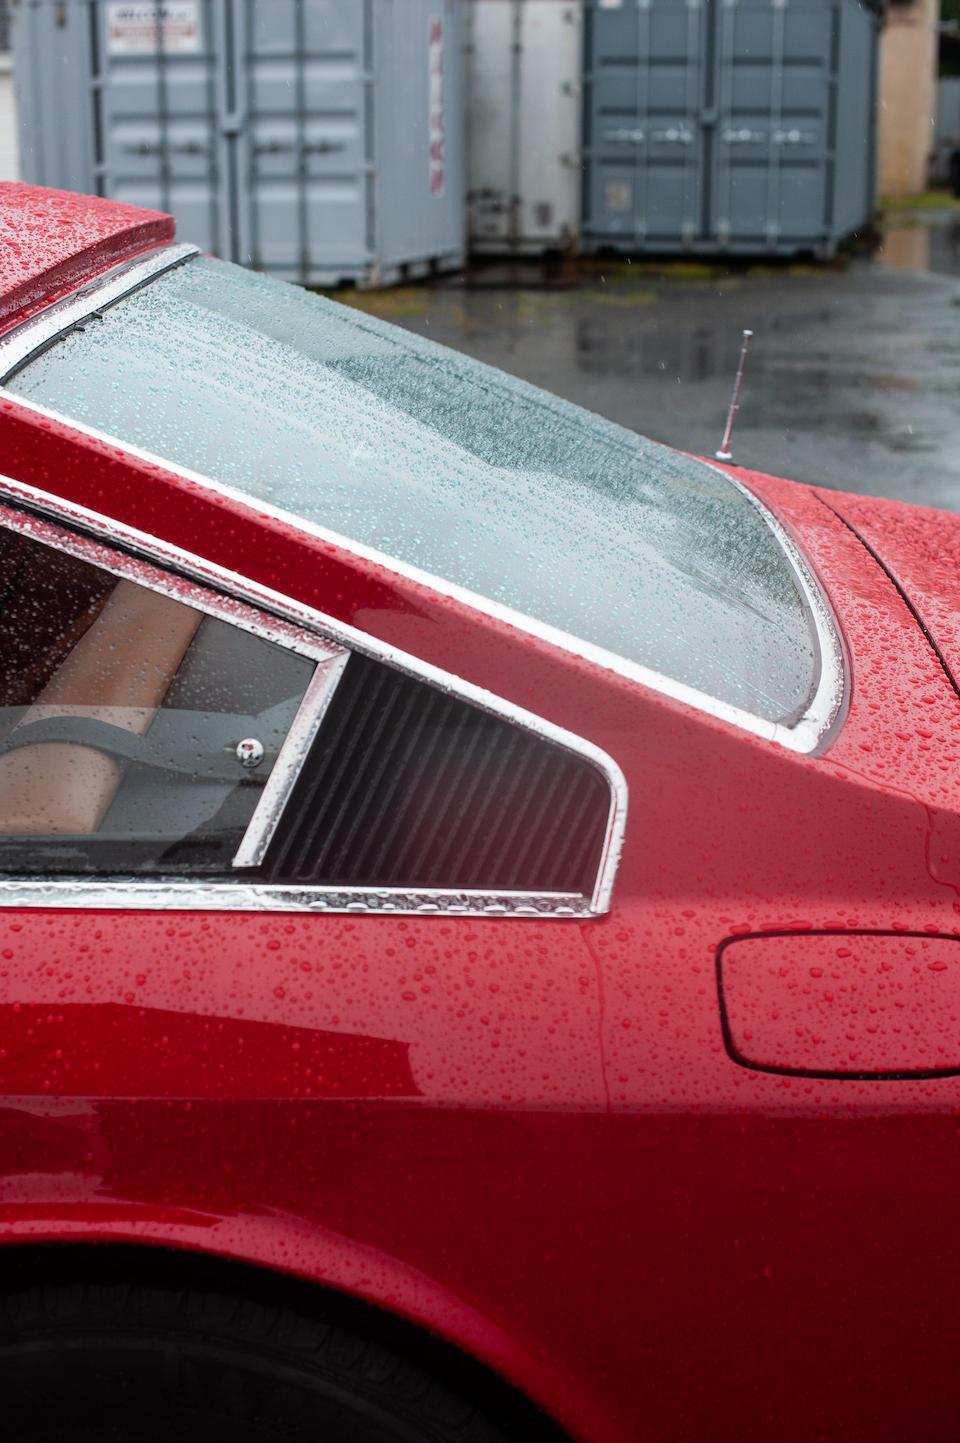 <b>1970 Ferrari 365 GT 2+2</b><br />Chassis no. 13989